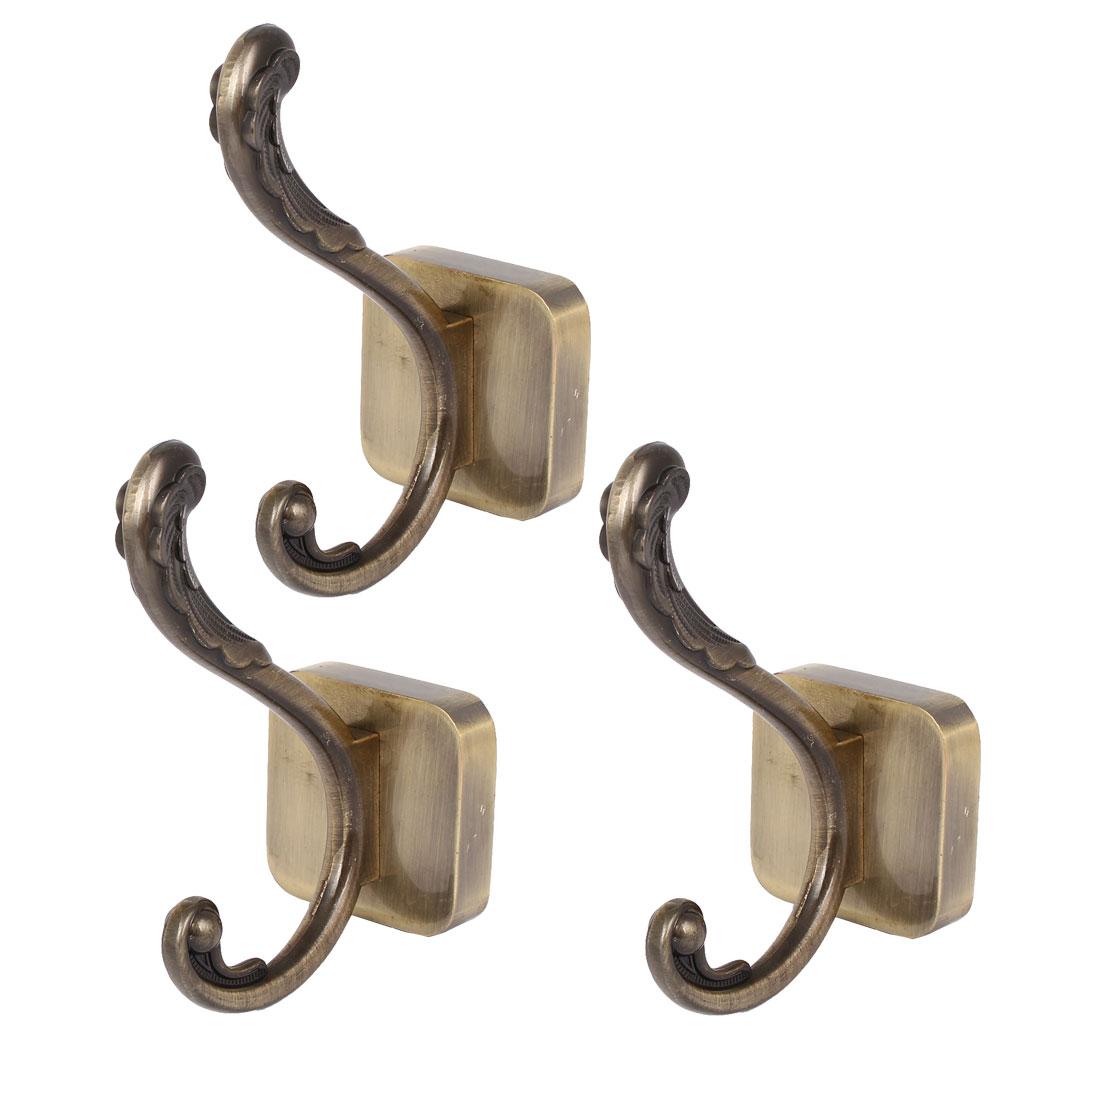 Home Coat Handbag Towel Metal Wall Mount Hanger Double Hook Bronze Tone 3pcs